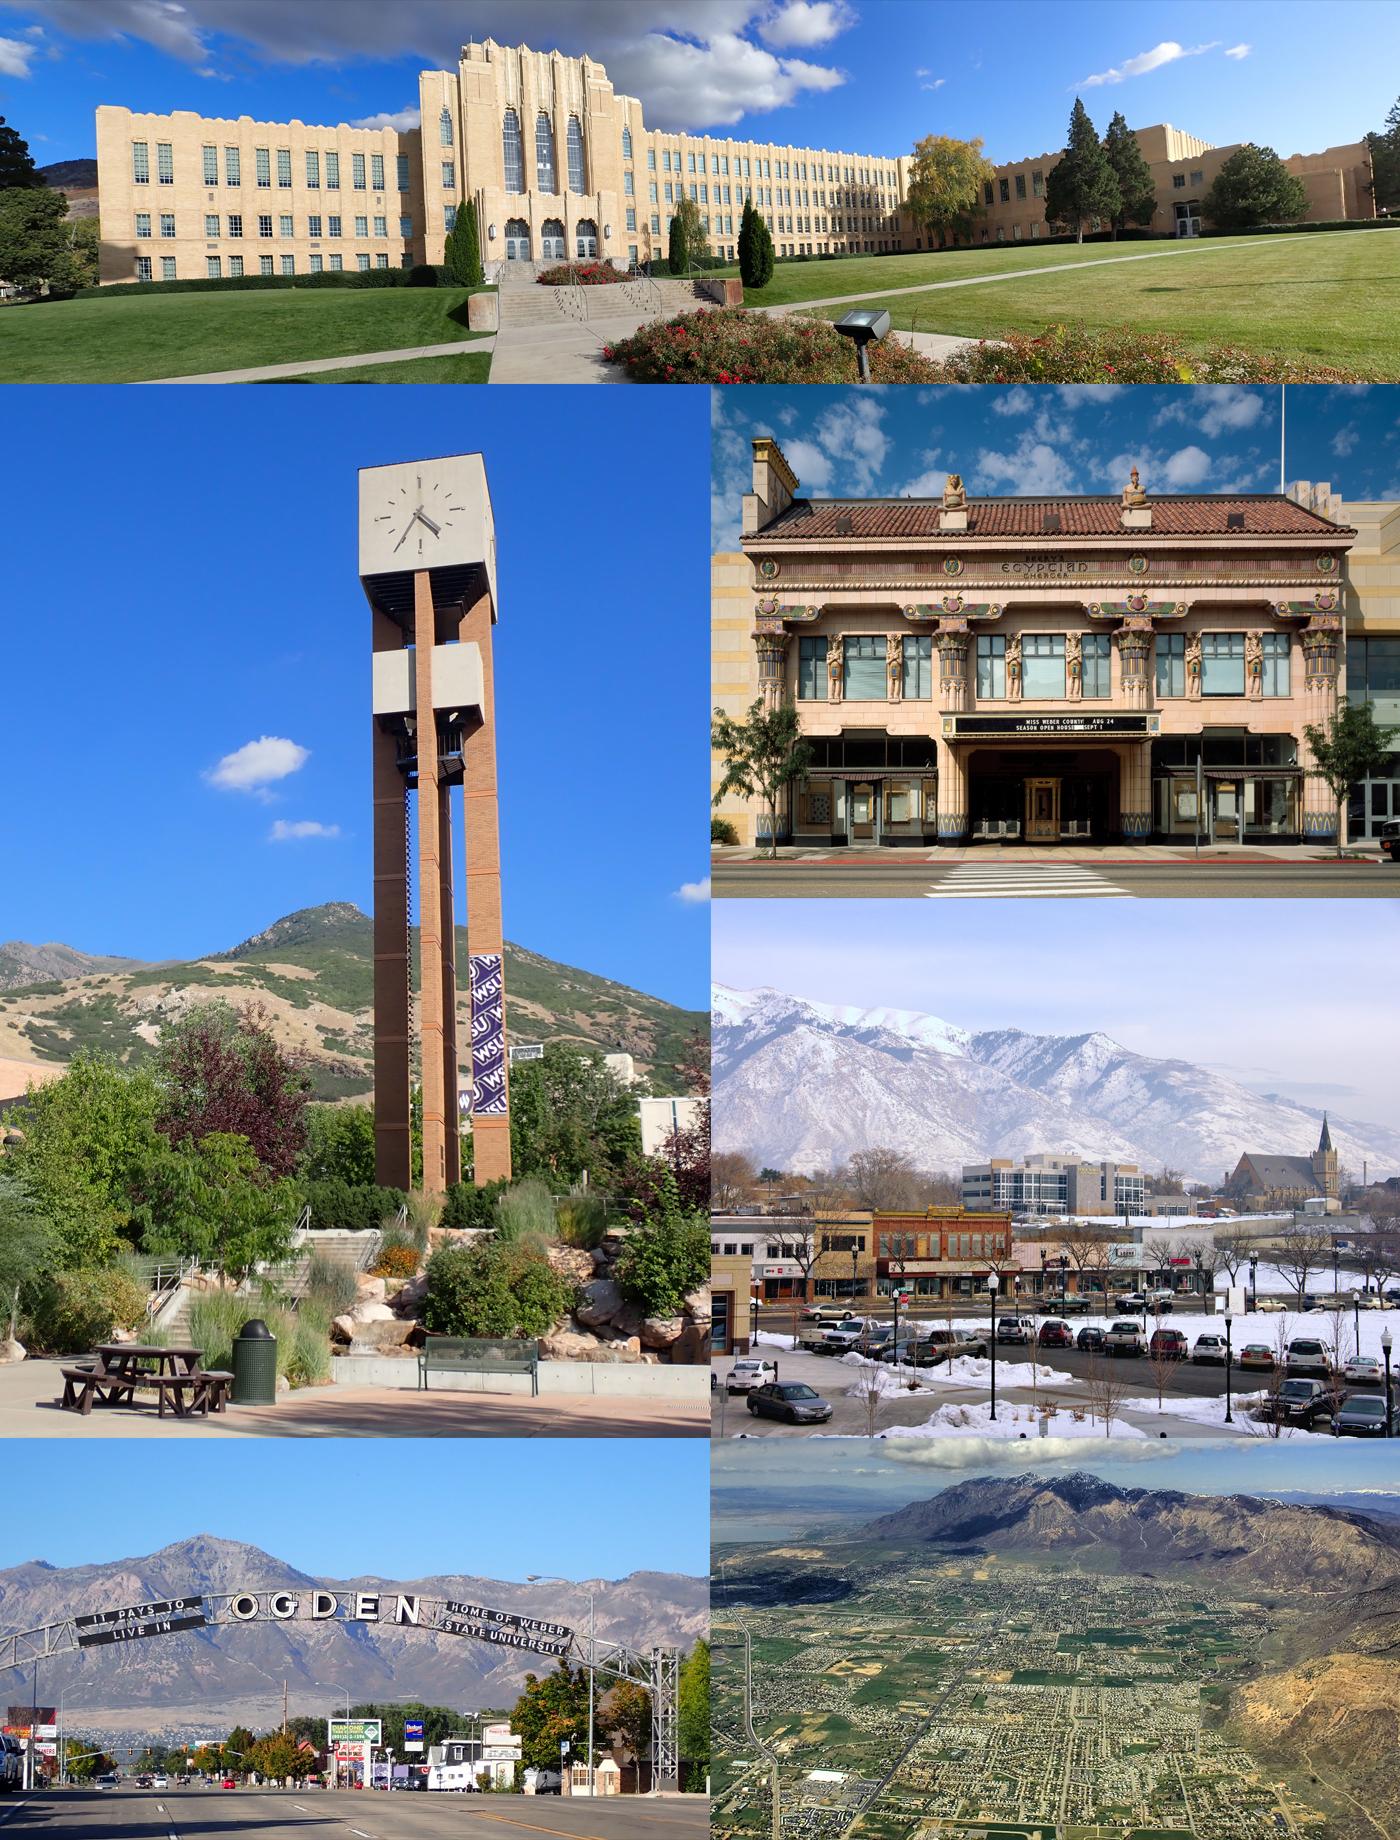 Ogden Utah Wikipedia